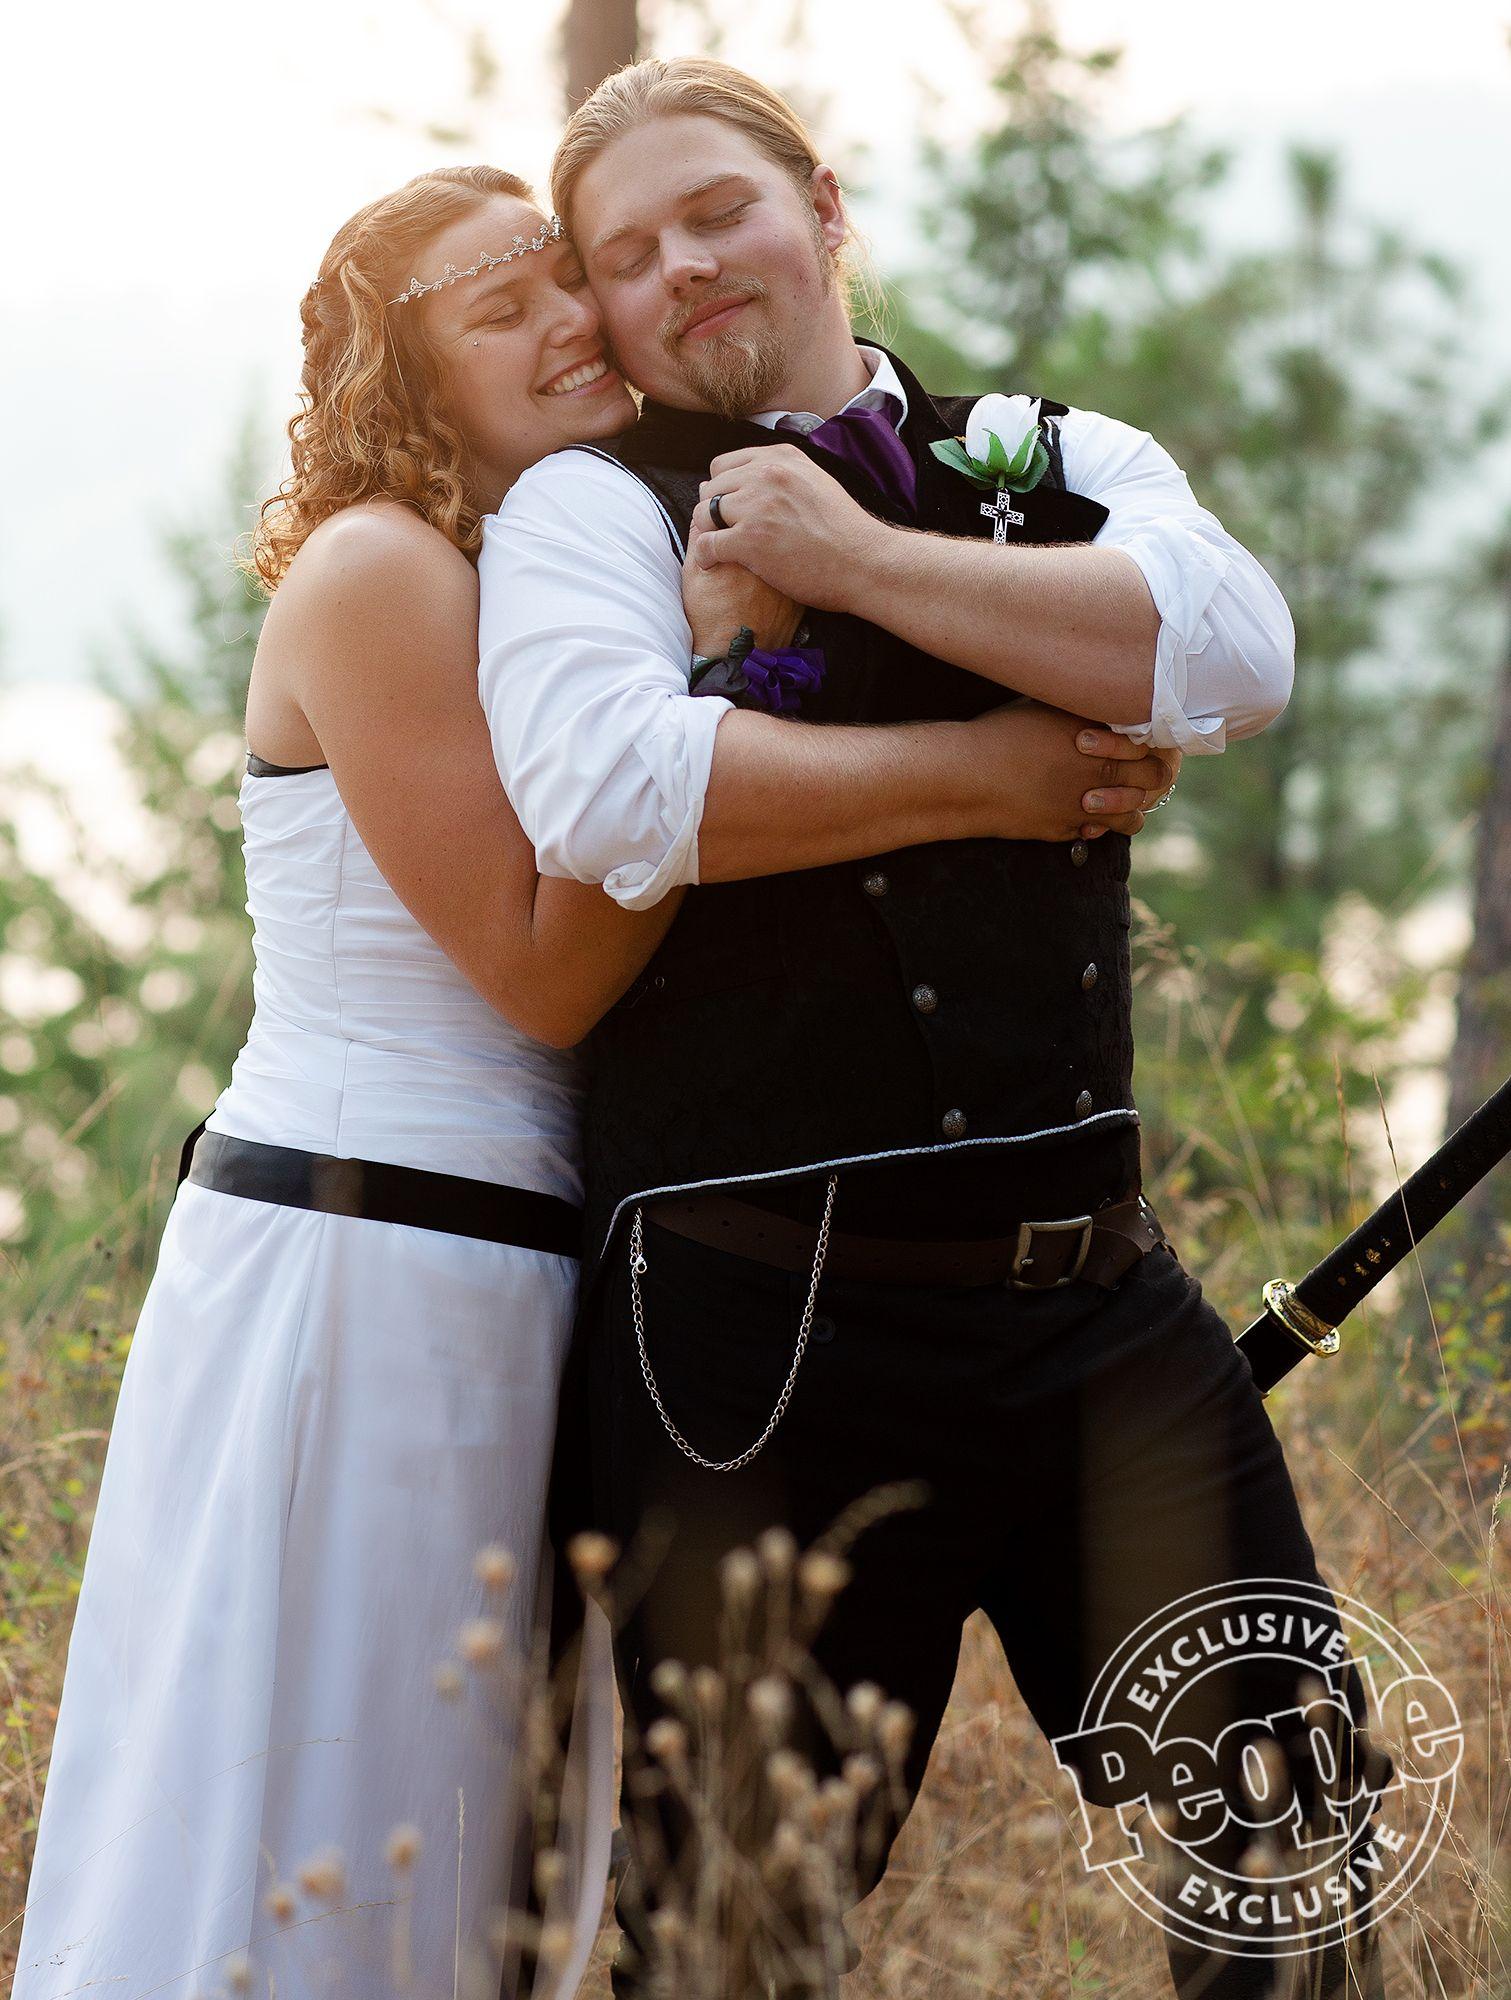 Alaskan Bush People S Noah Brown Is Married Inside The Idaho